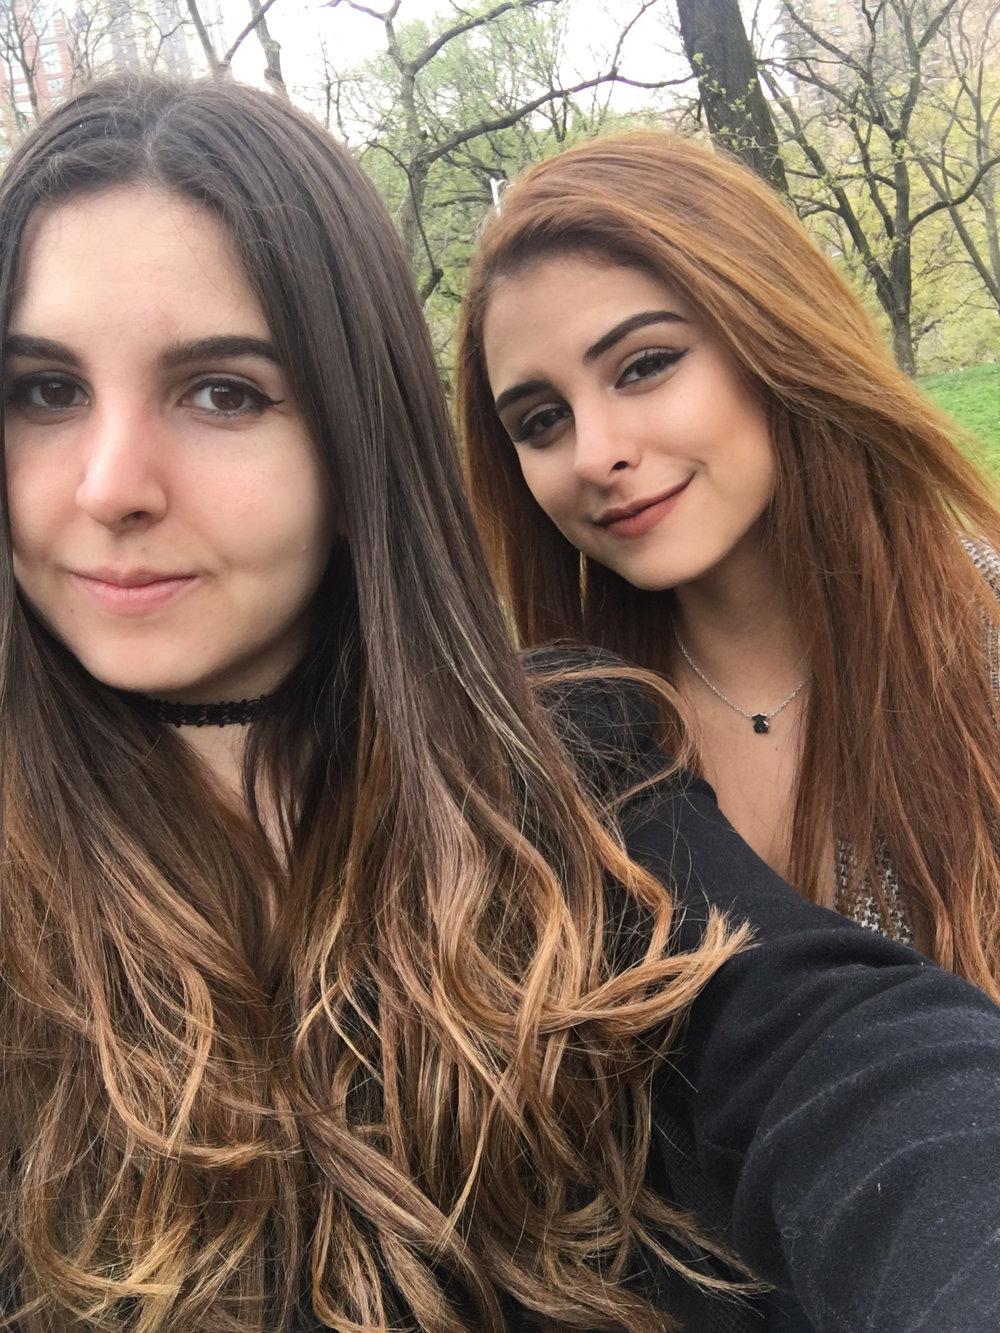 Anne y yo en Central Park